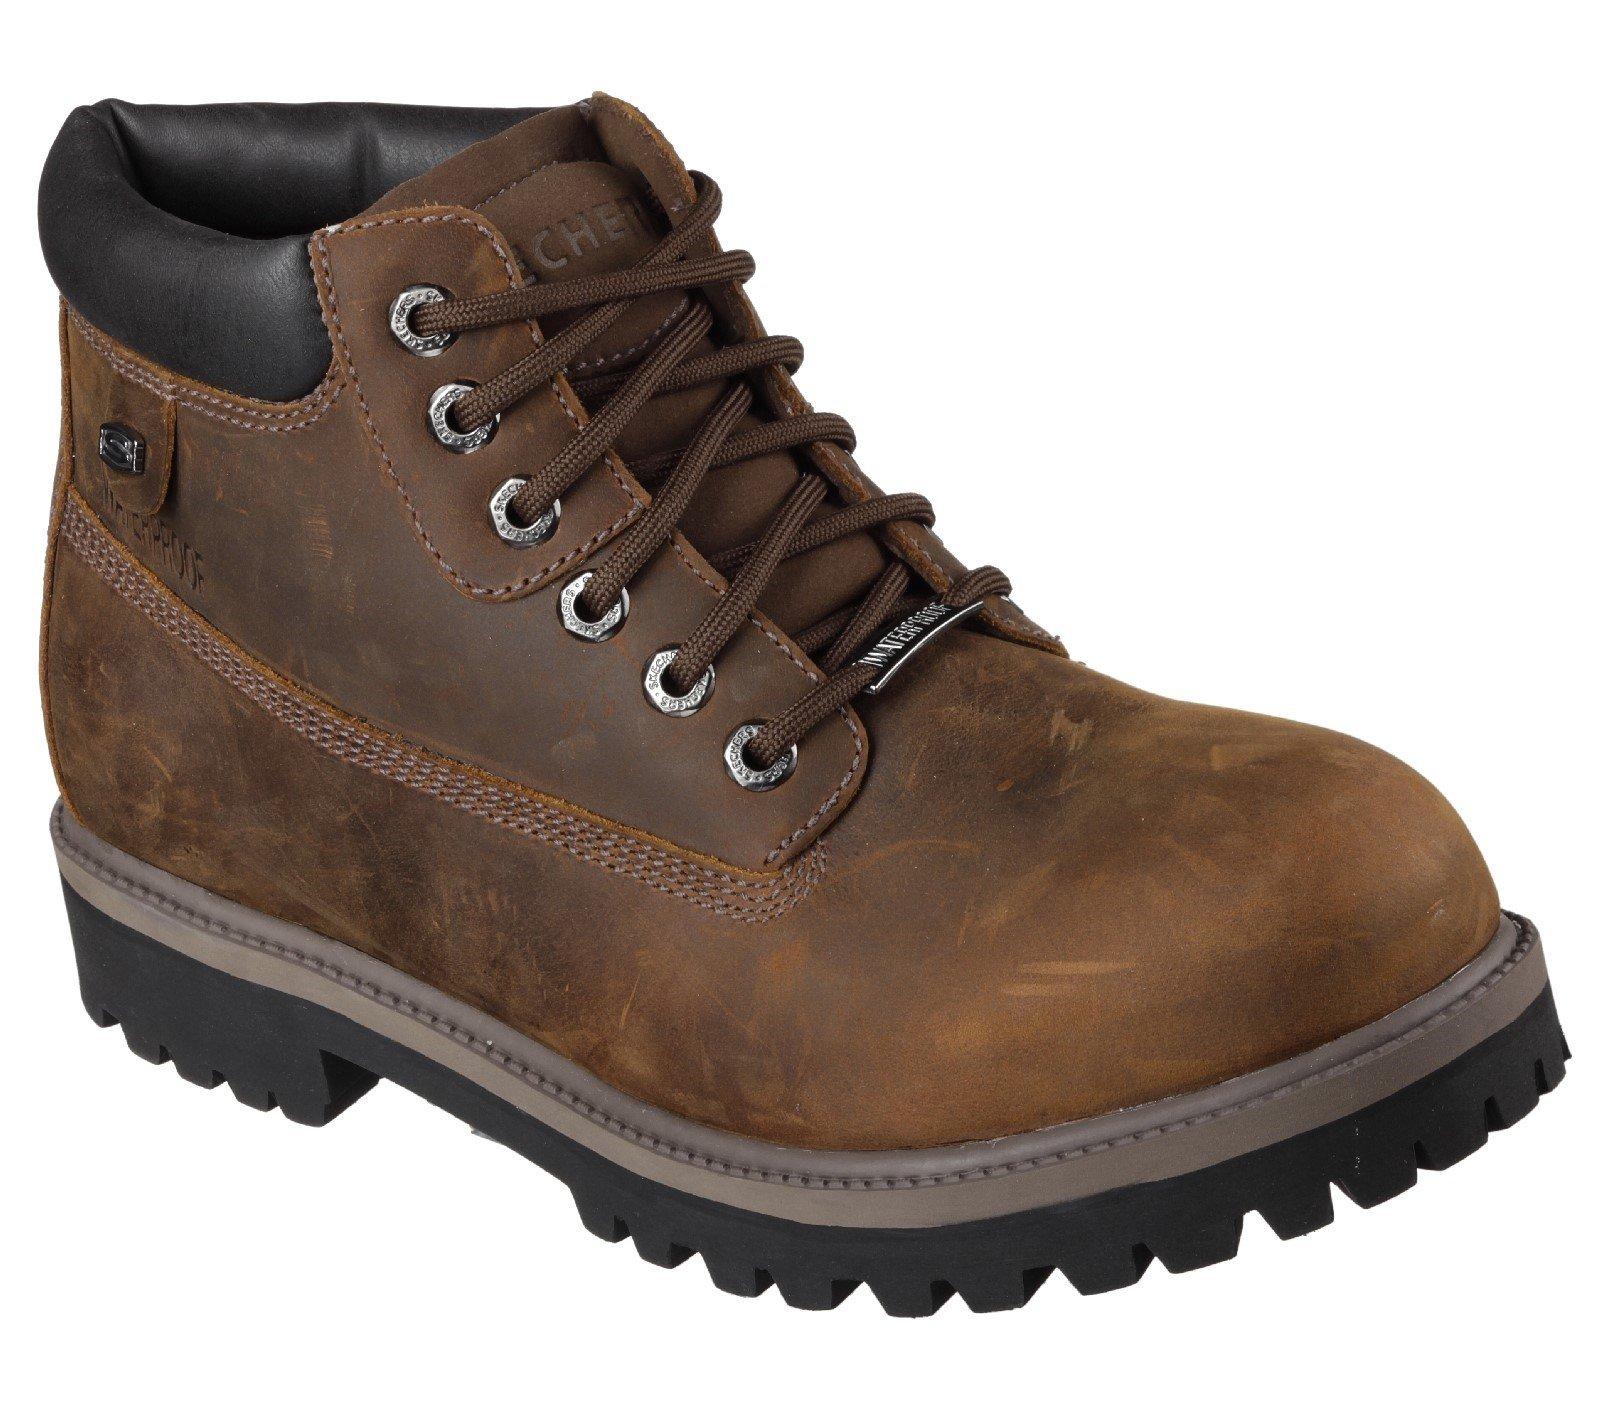 Skechers Unisex Sergeants Verdict Boot Various Colours 18261 - Brown 6